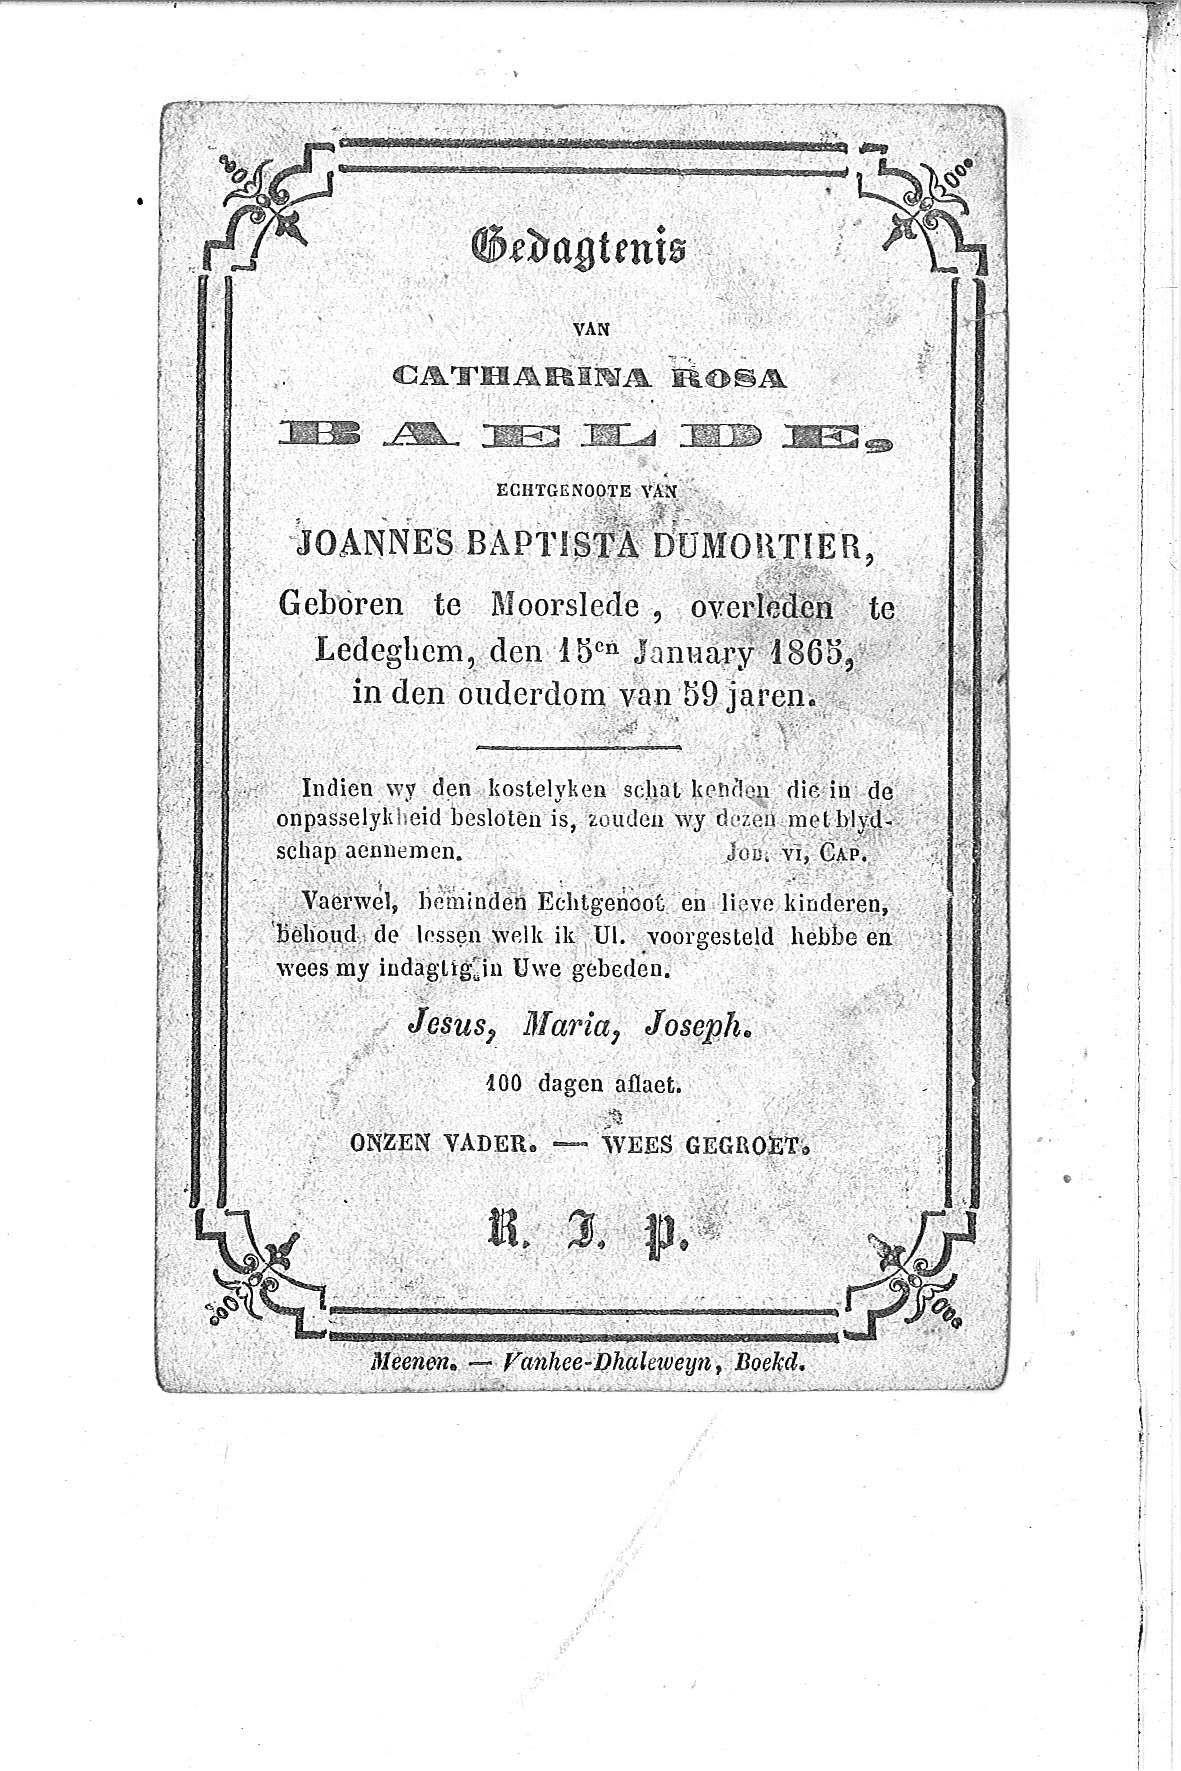 Catharina-Rosa(1865)20100928110430_00014.jpg